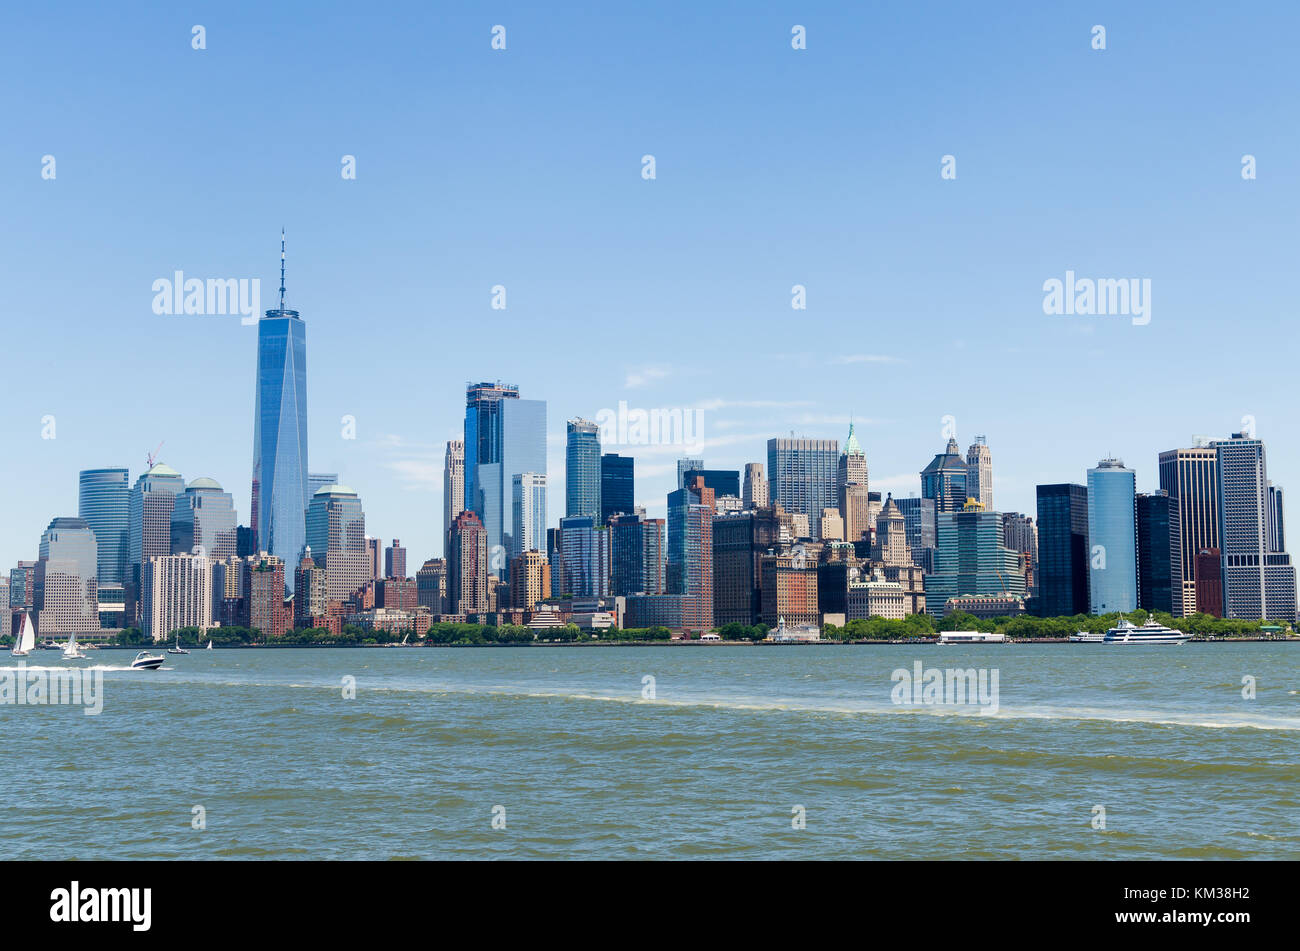 New York skylines - Stock Image